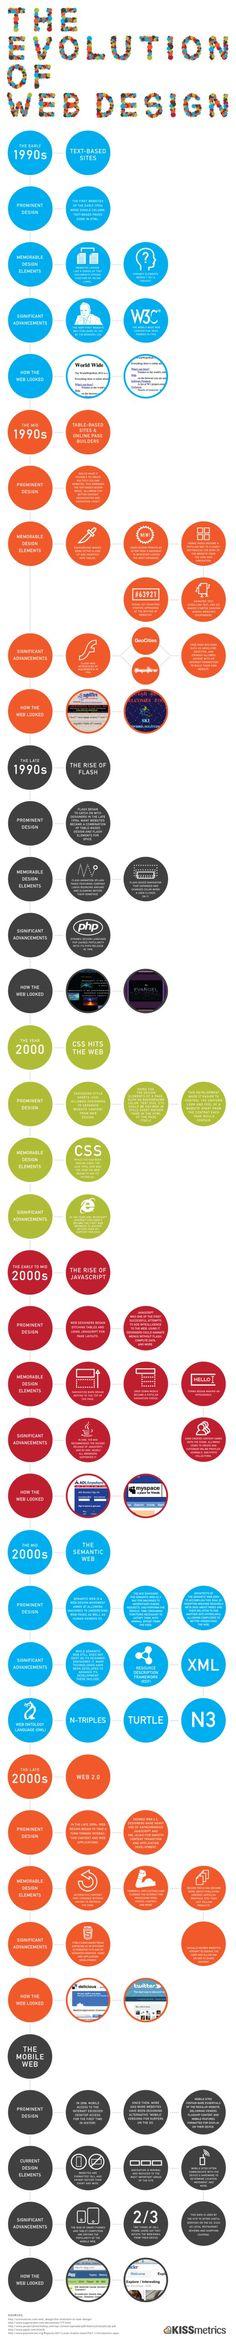 The Evolution of Web Design [Infographic]